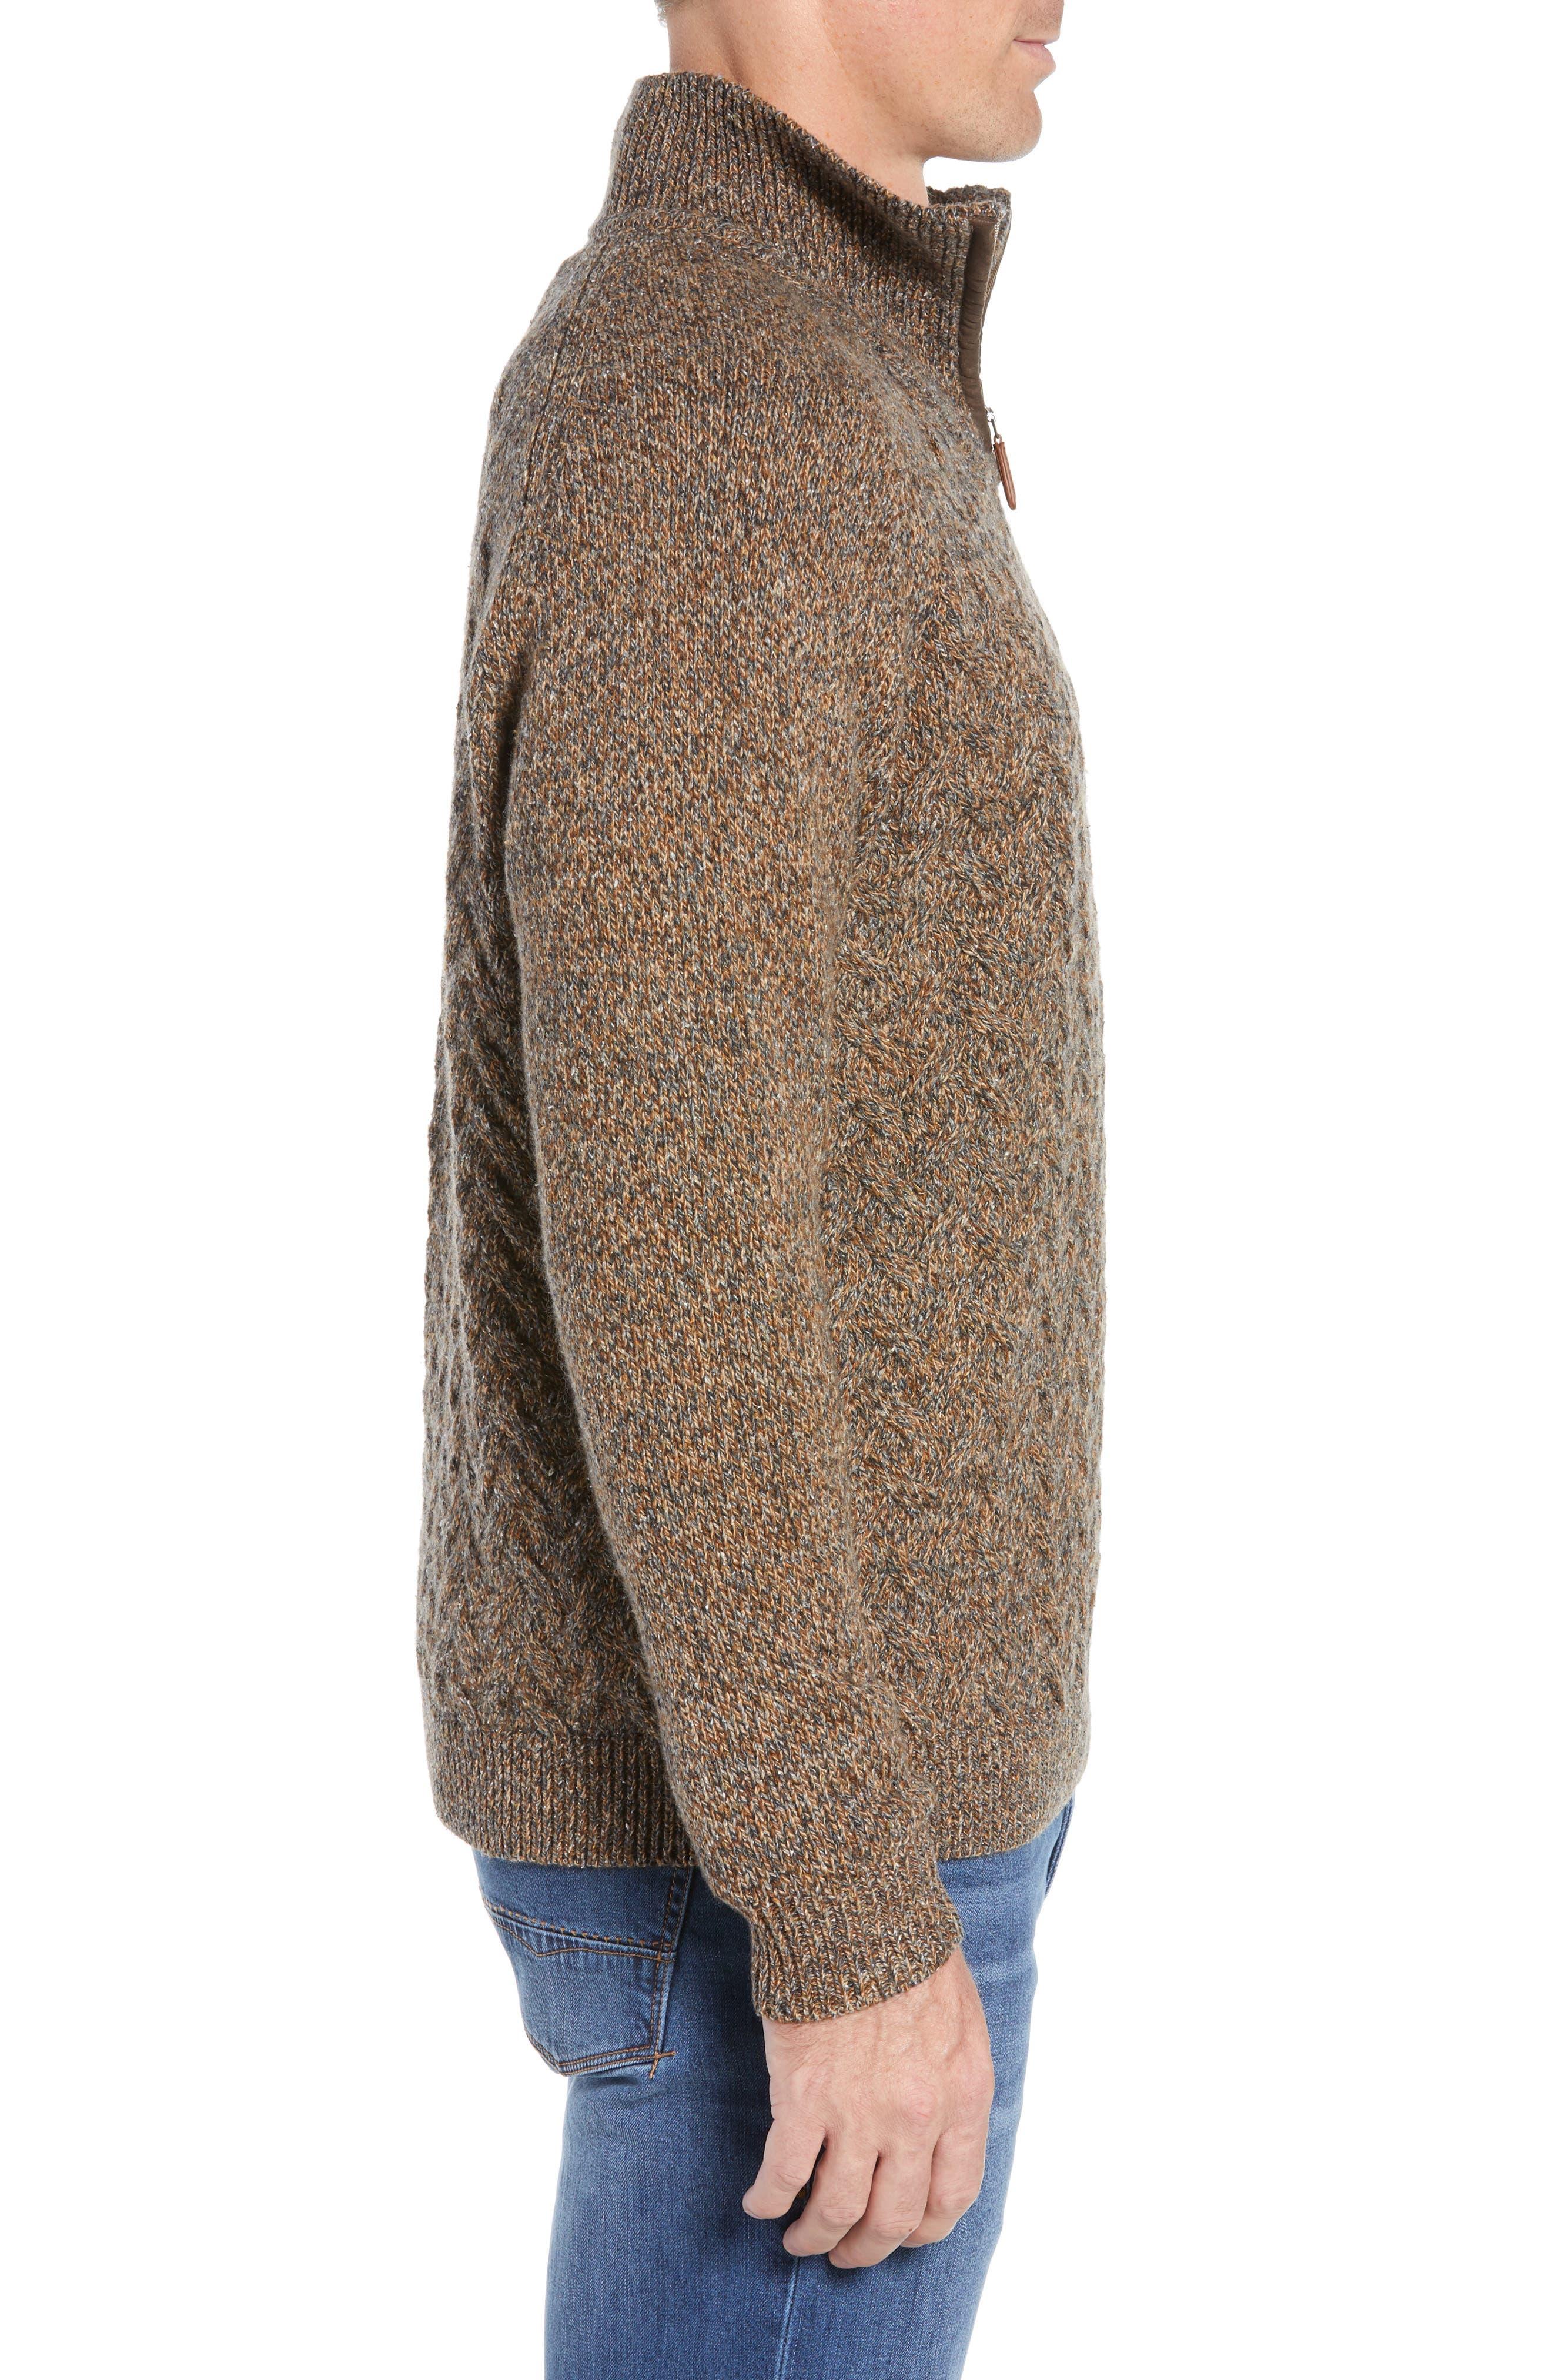 Irazu Half Zip Sweater,                             Alternate thumbnail 3, color,                             201